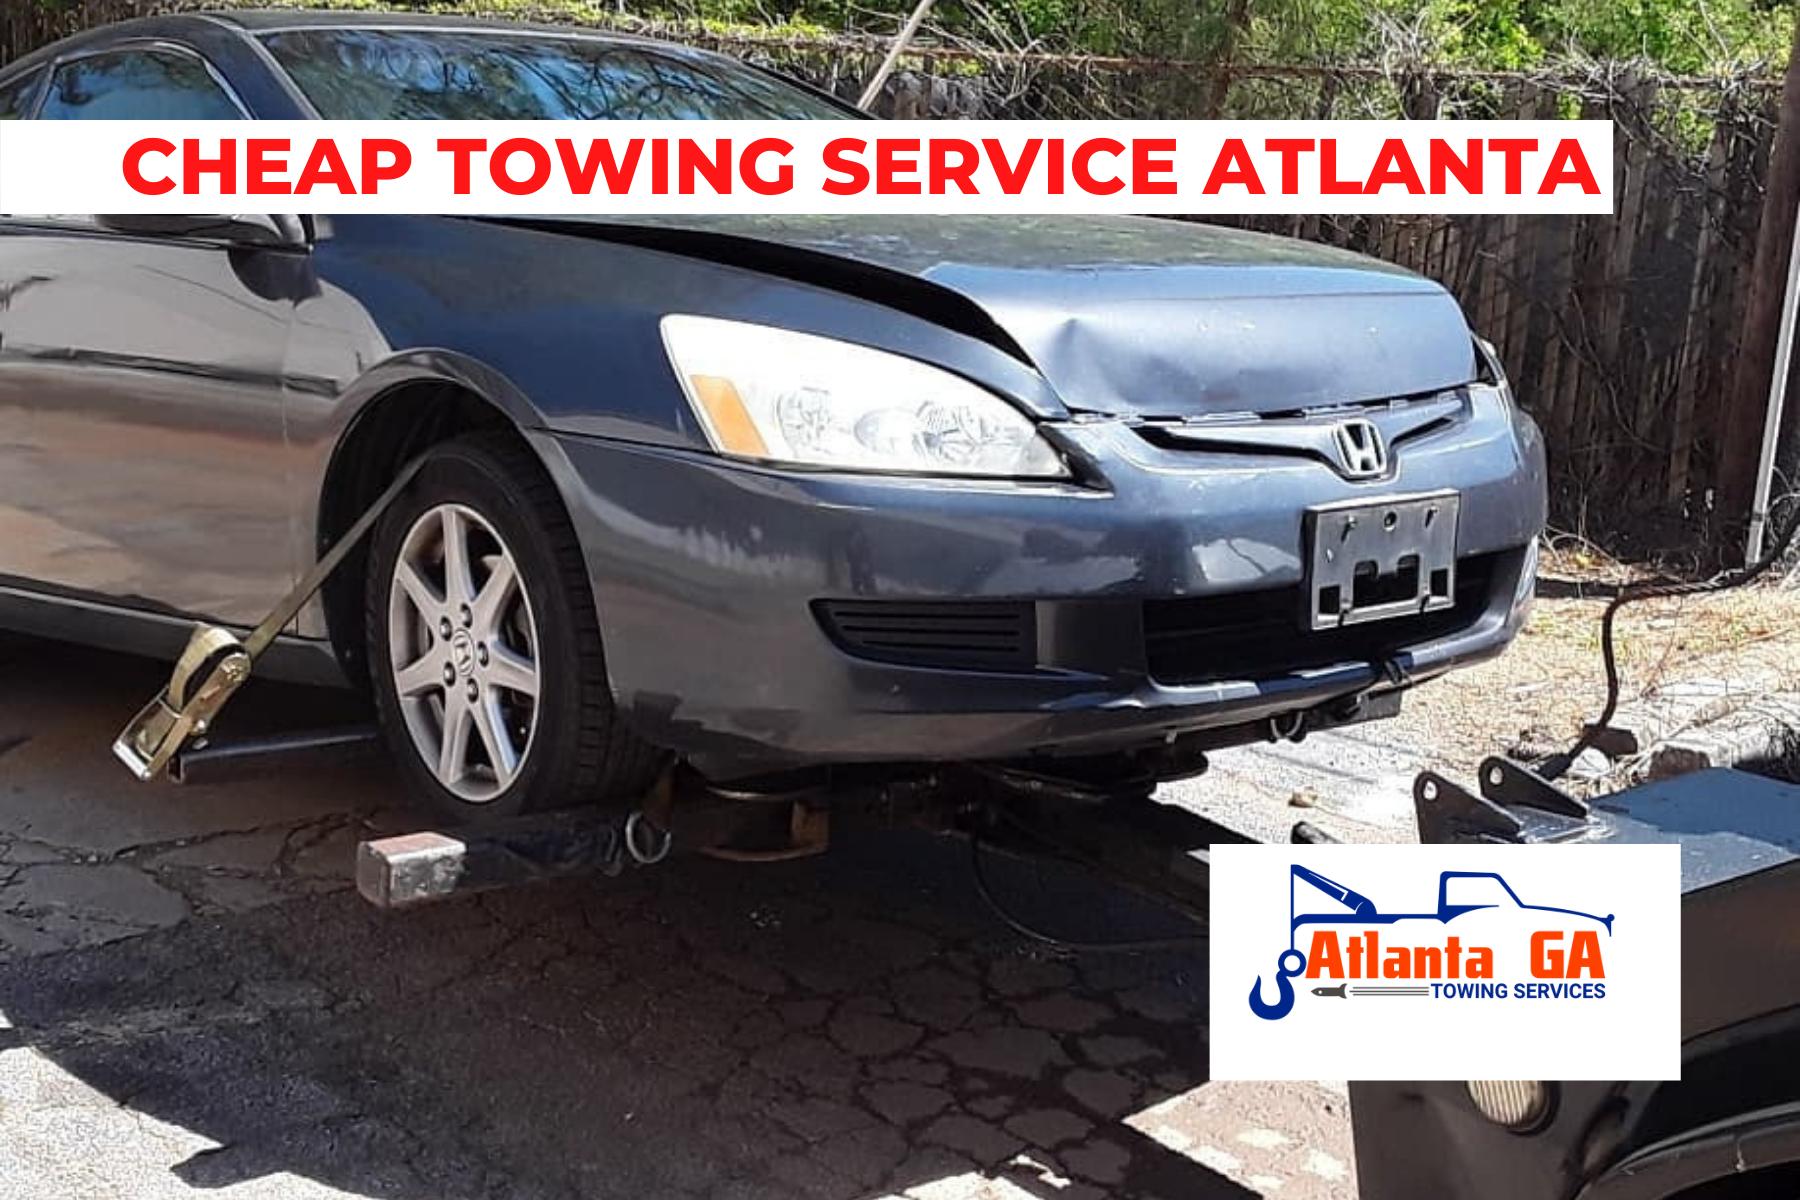 CHEAP TOWING SERVICES IN ATLANTA